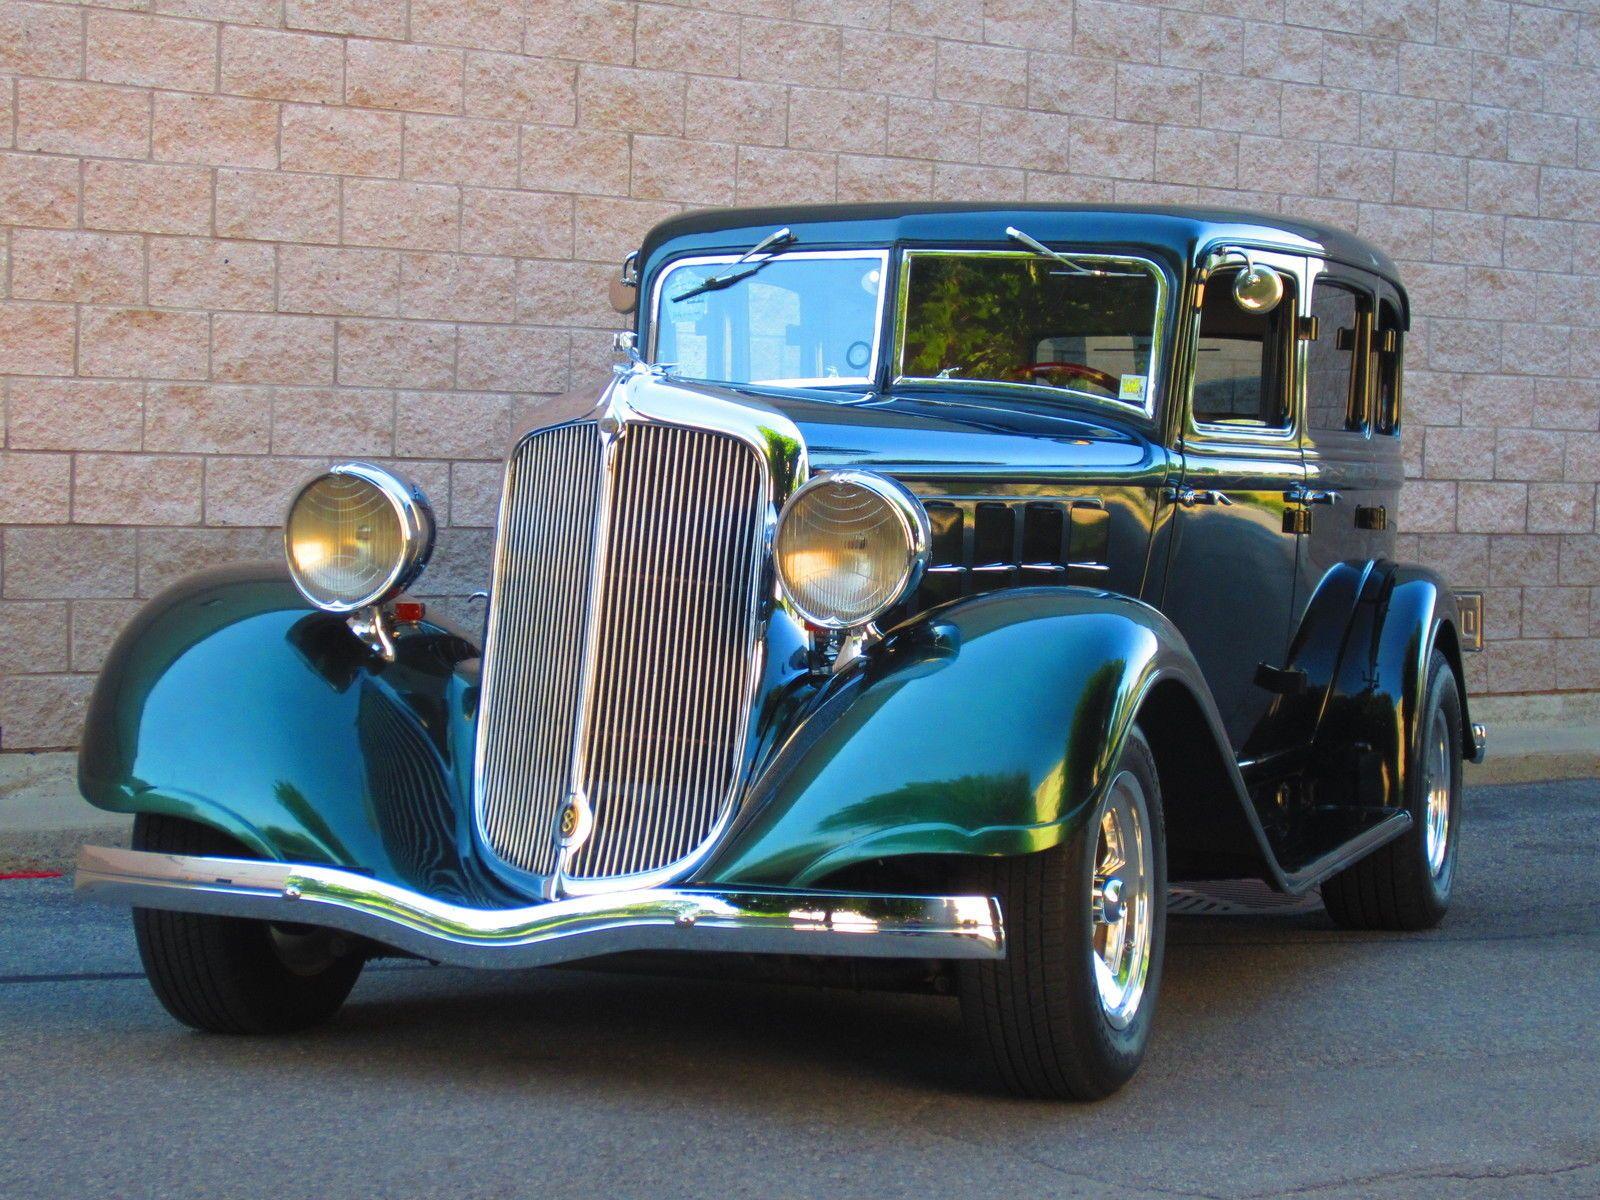 1933 Chrysler Other Royal 8 4 door Sedan | Sedans, Motor car and Mopar